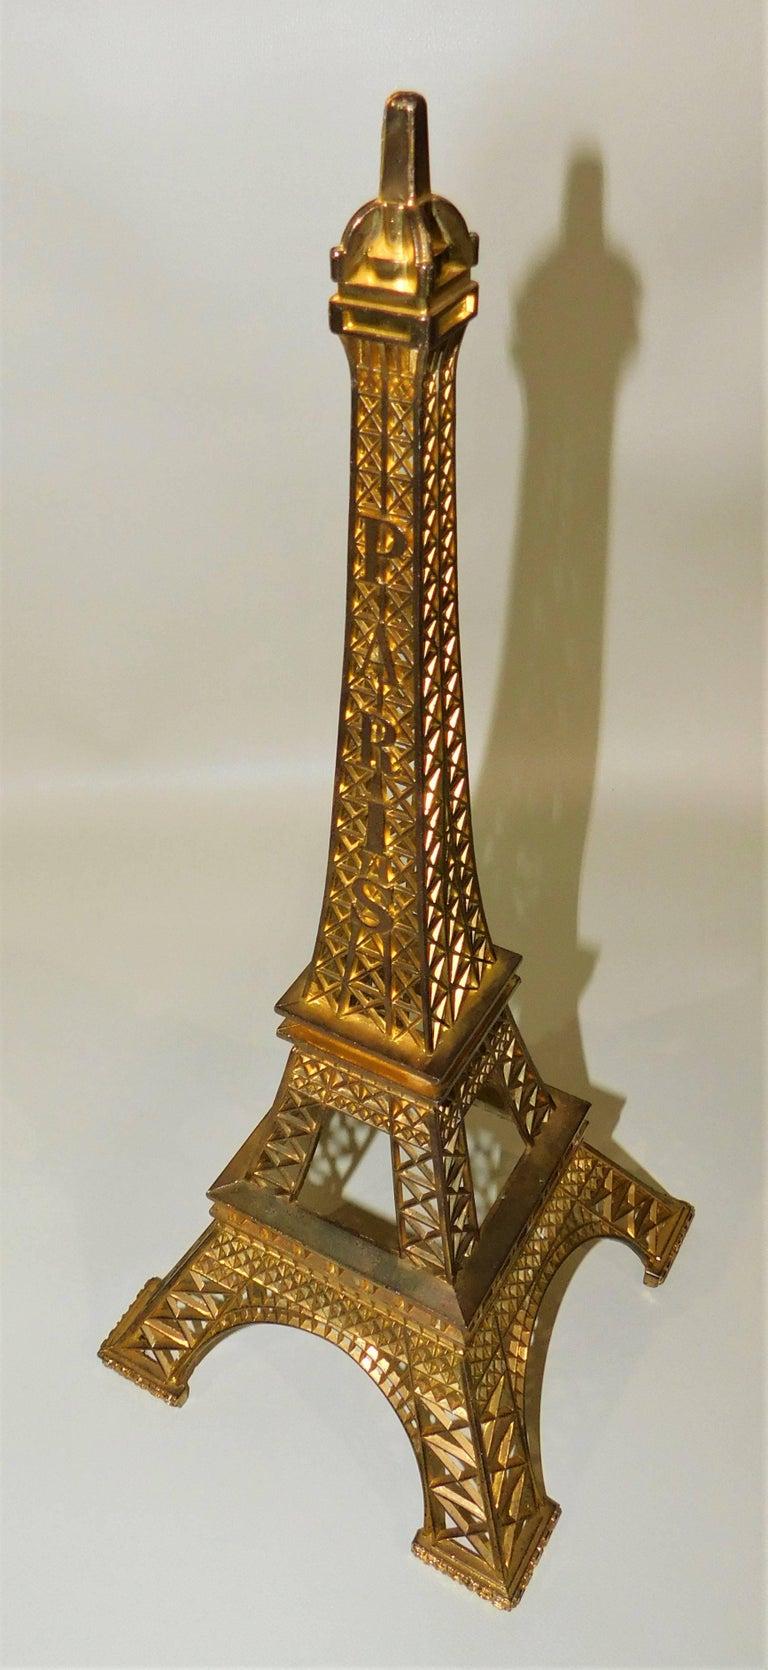 Eiffel Tower Paris France Gilt Metal Display Model Souvenir 2